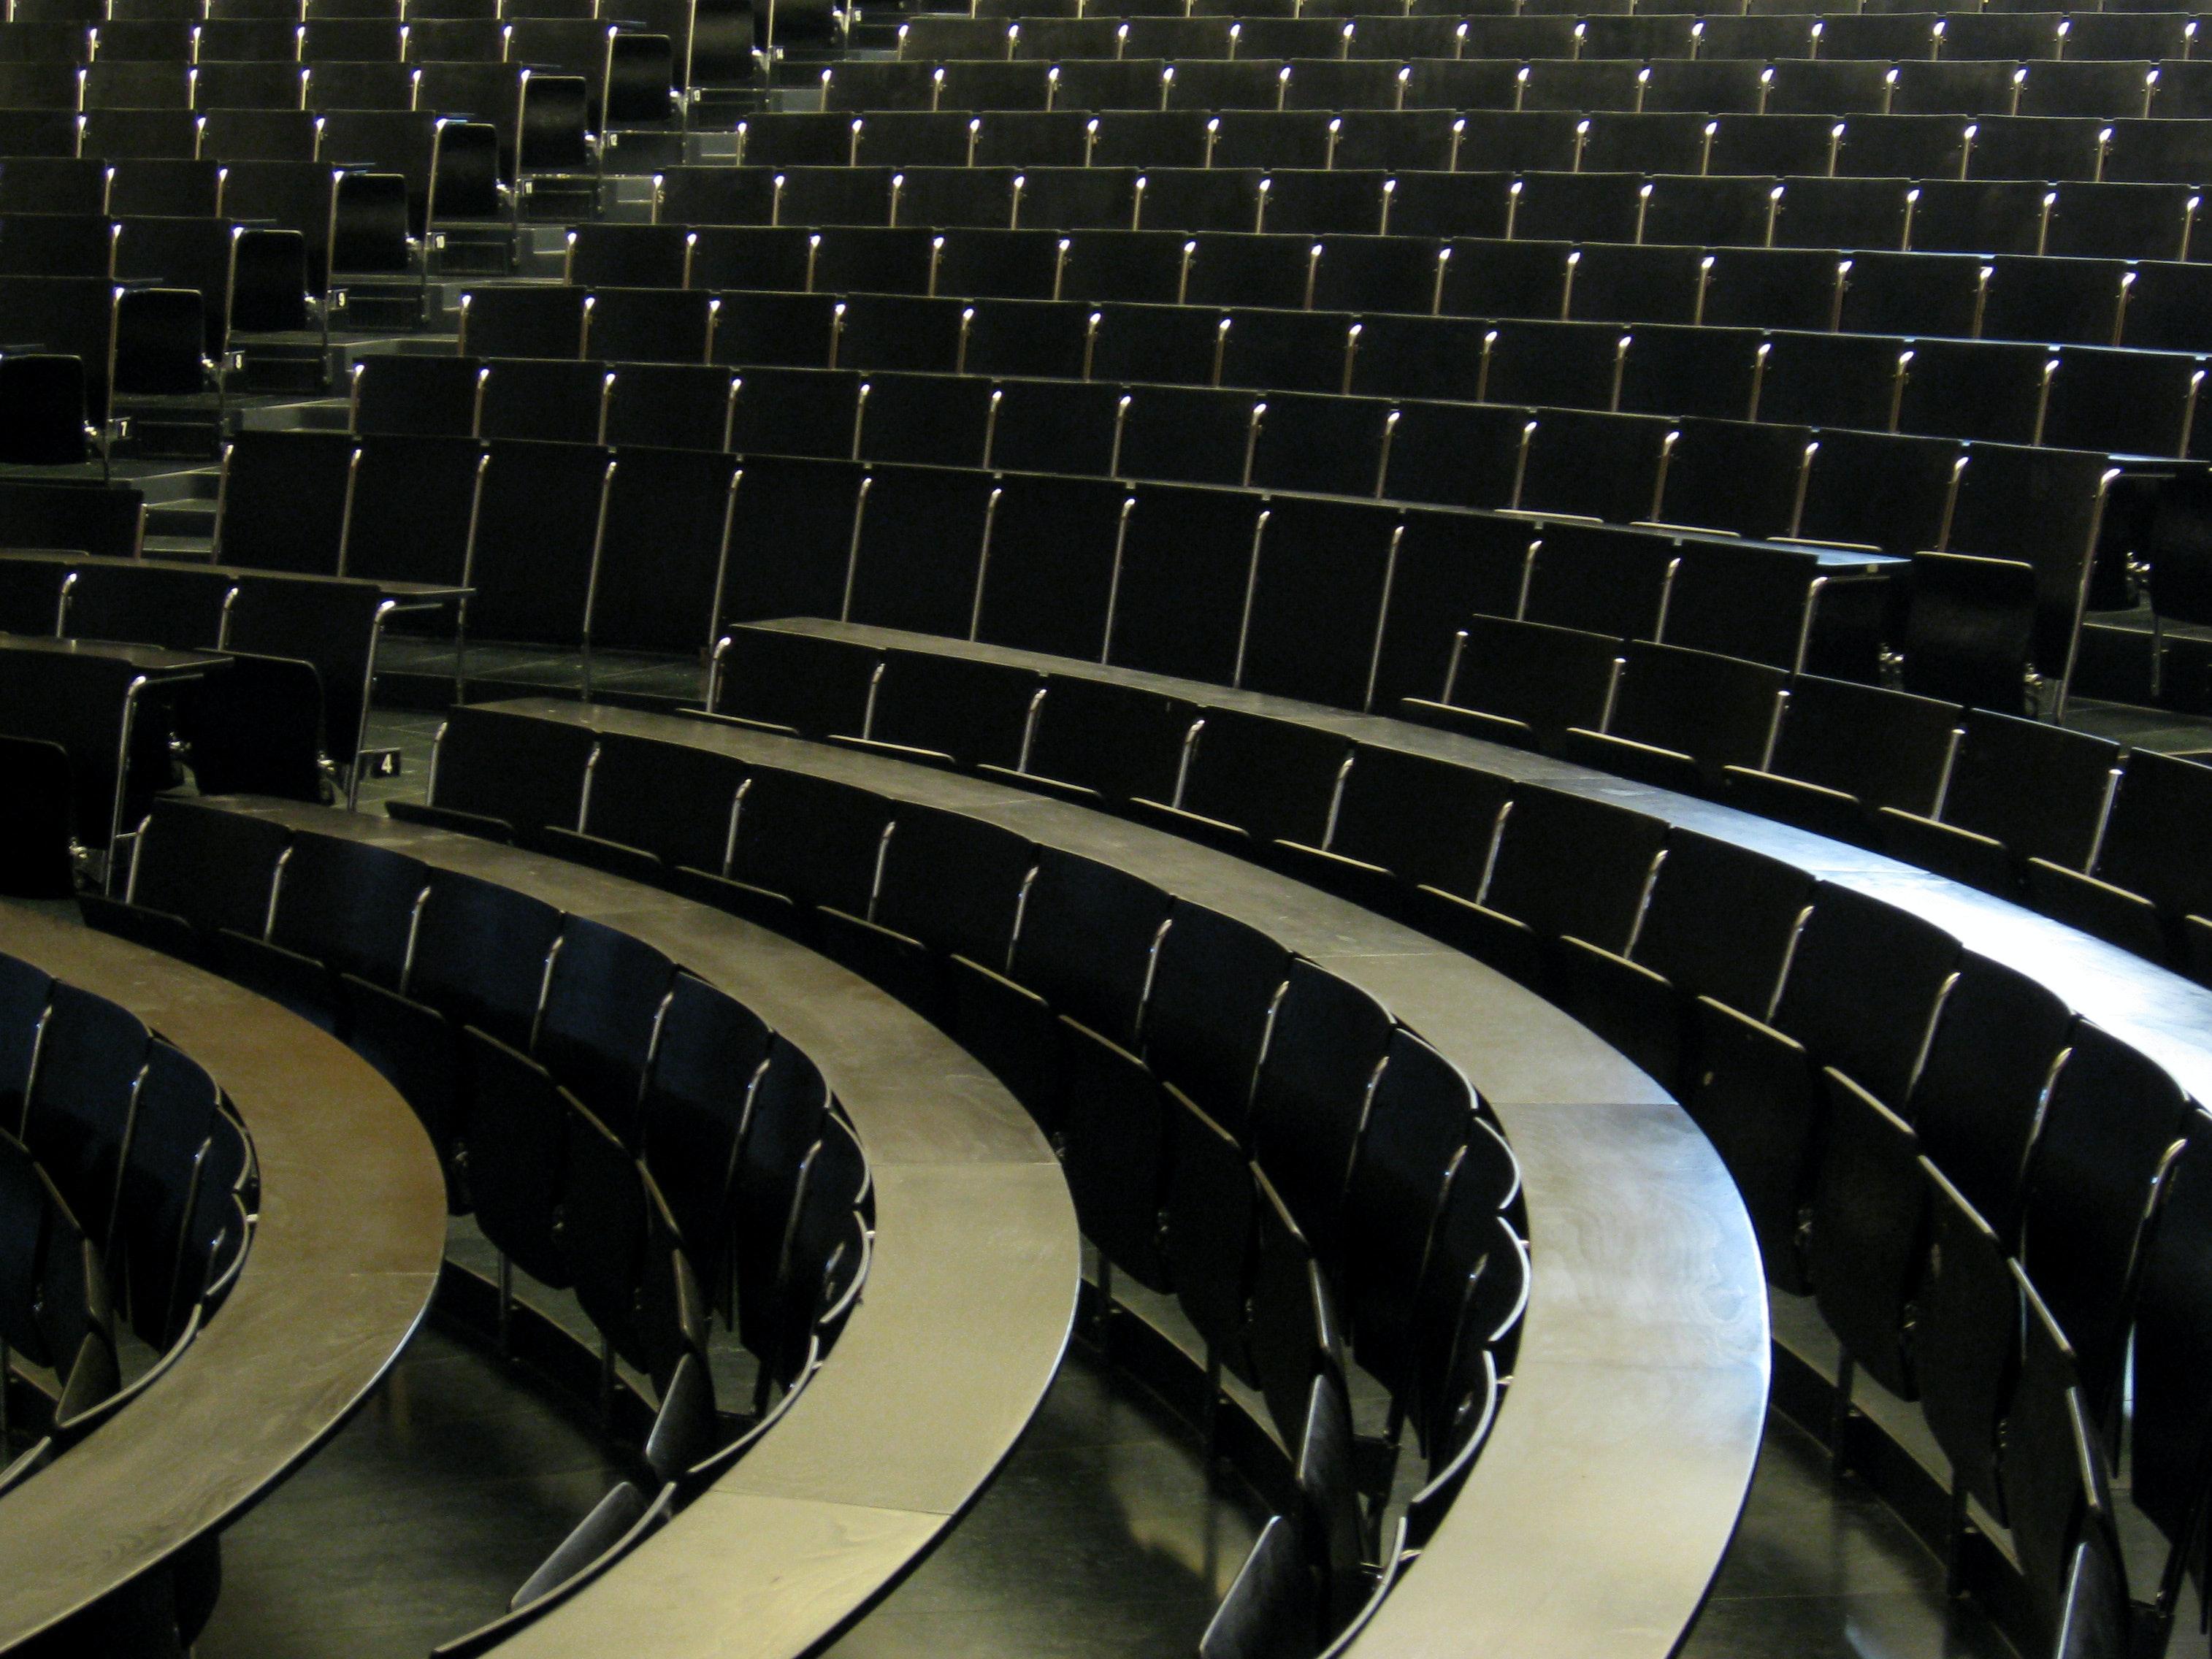 Lecture hall metaphor higher education Switzerland